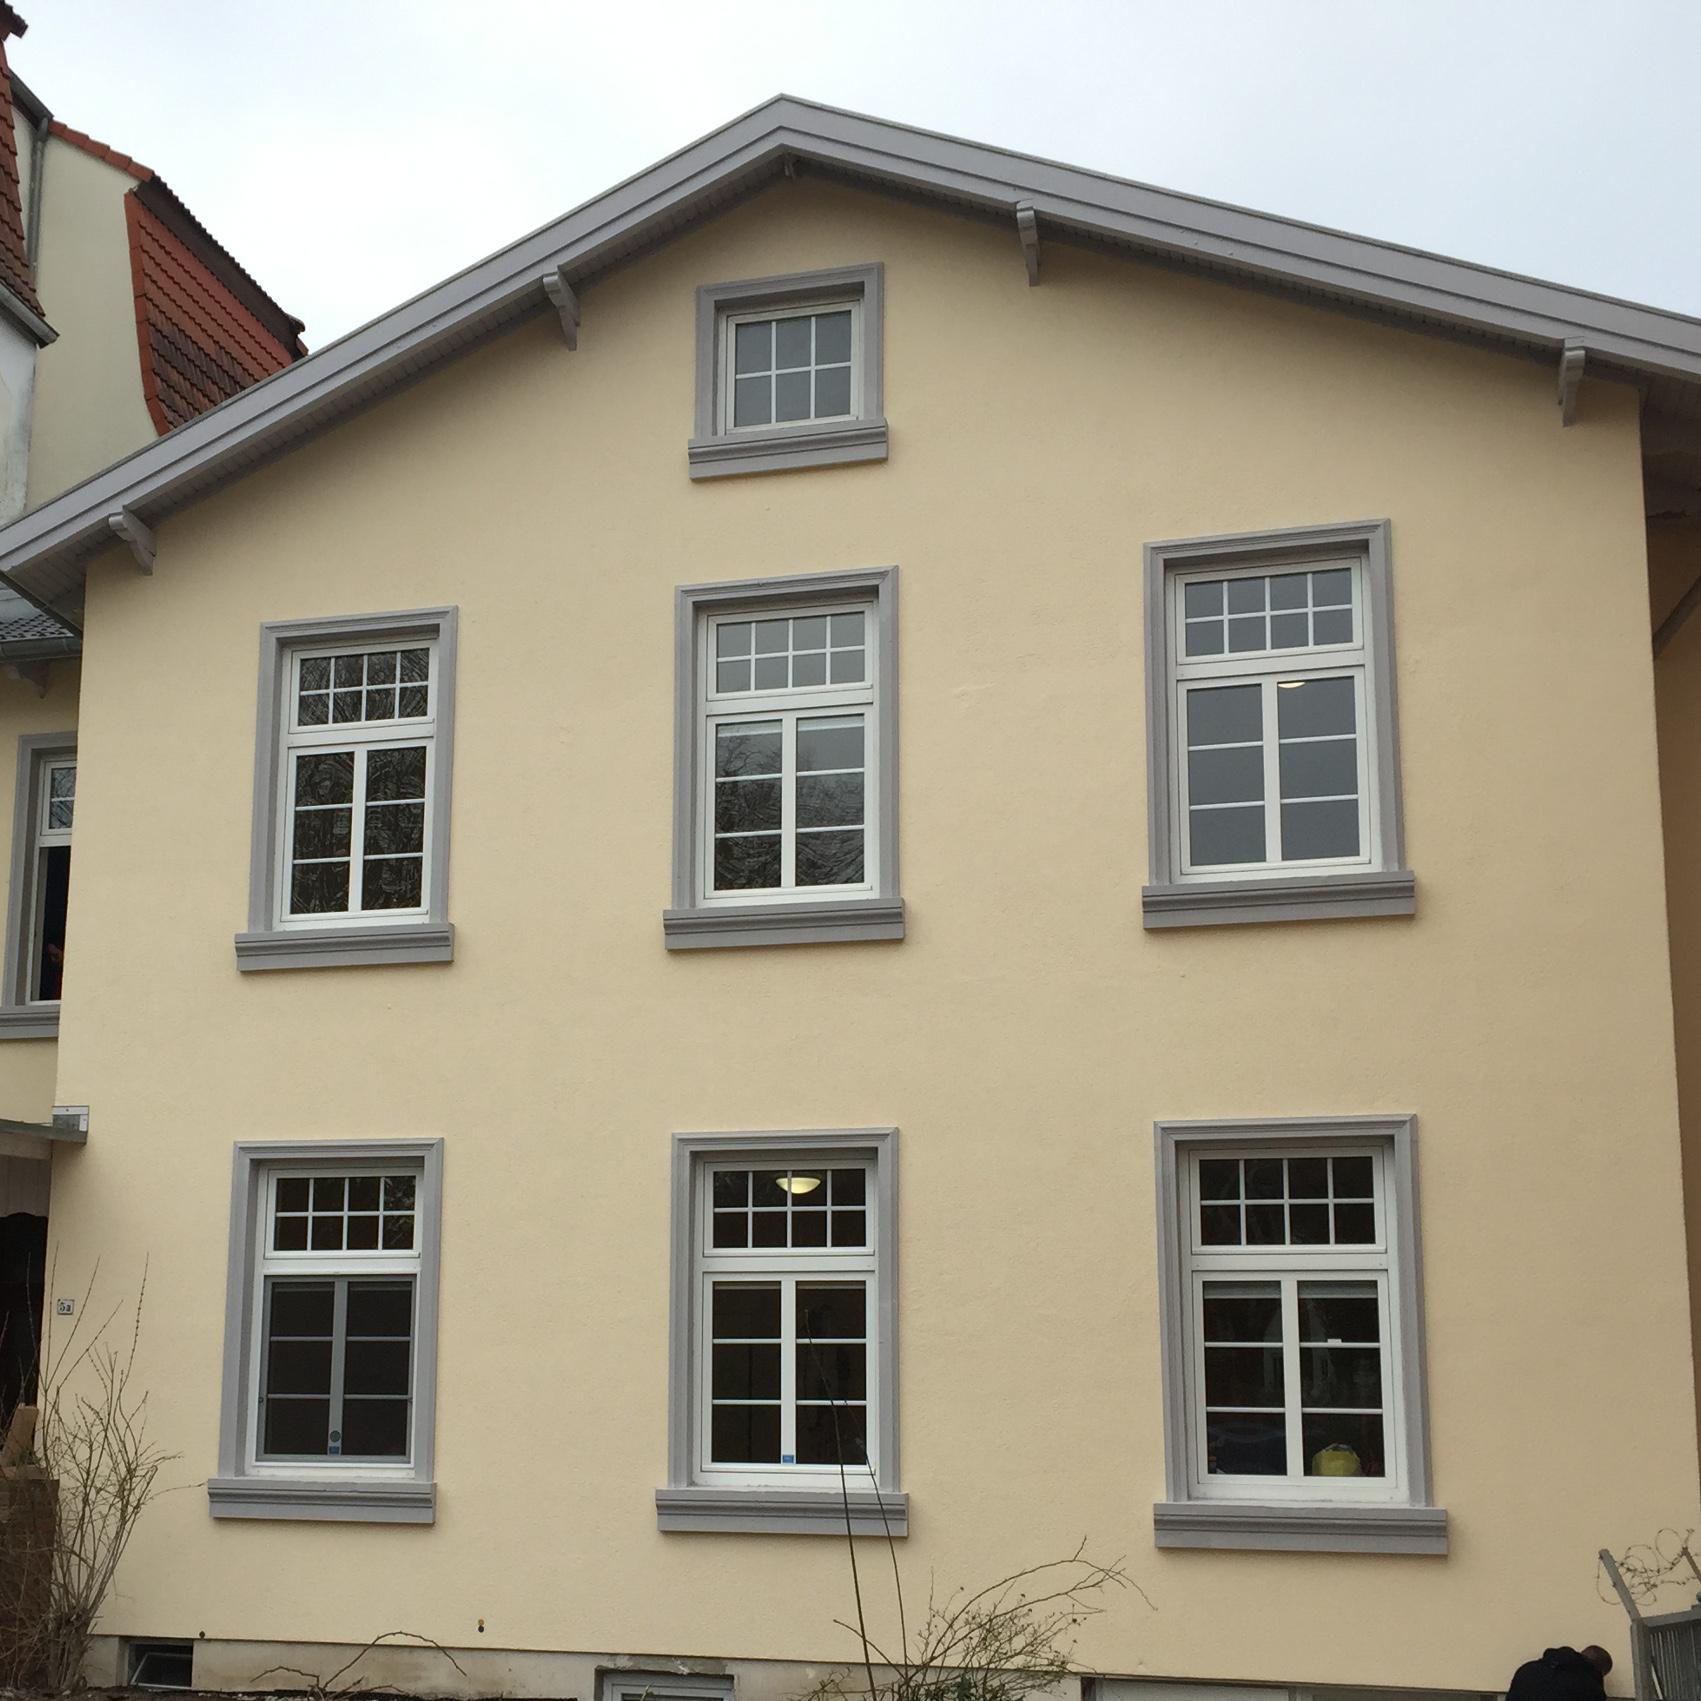 zwergenland l beck gpk architekten in l beck. Black Bedroom Furniture Sets. Home Design Ideas